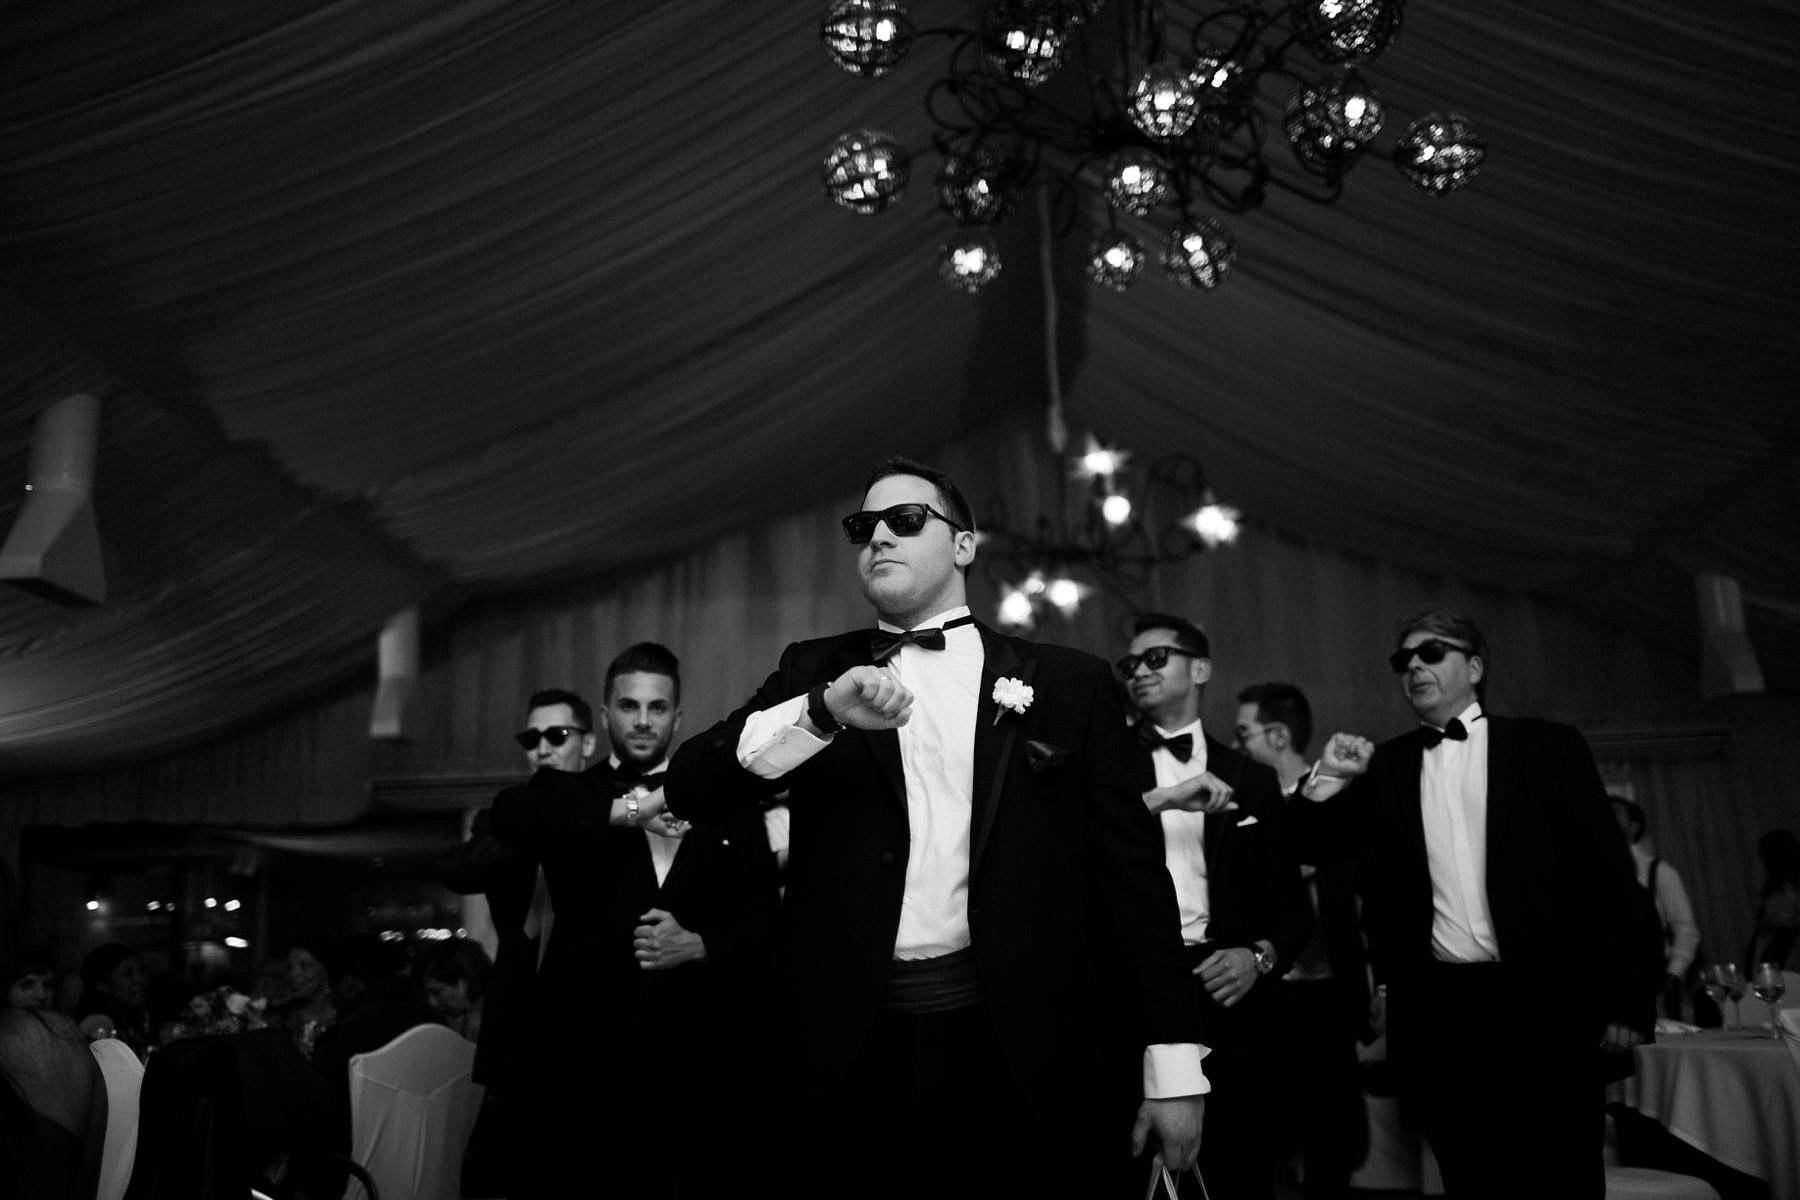 fotografo de bodas Jairo Crena-200